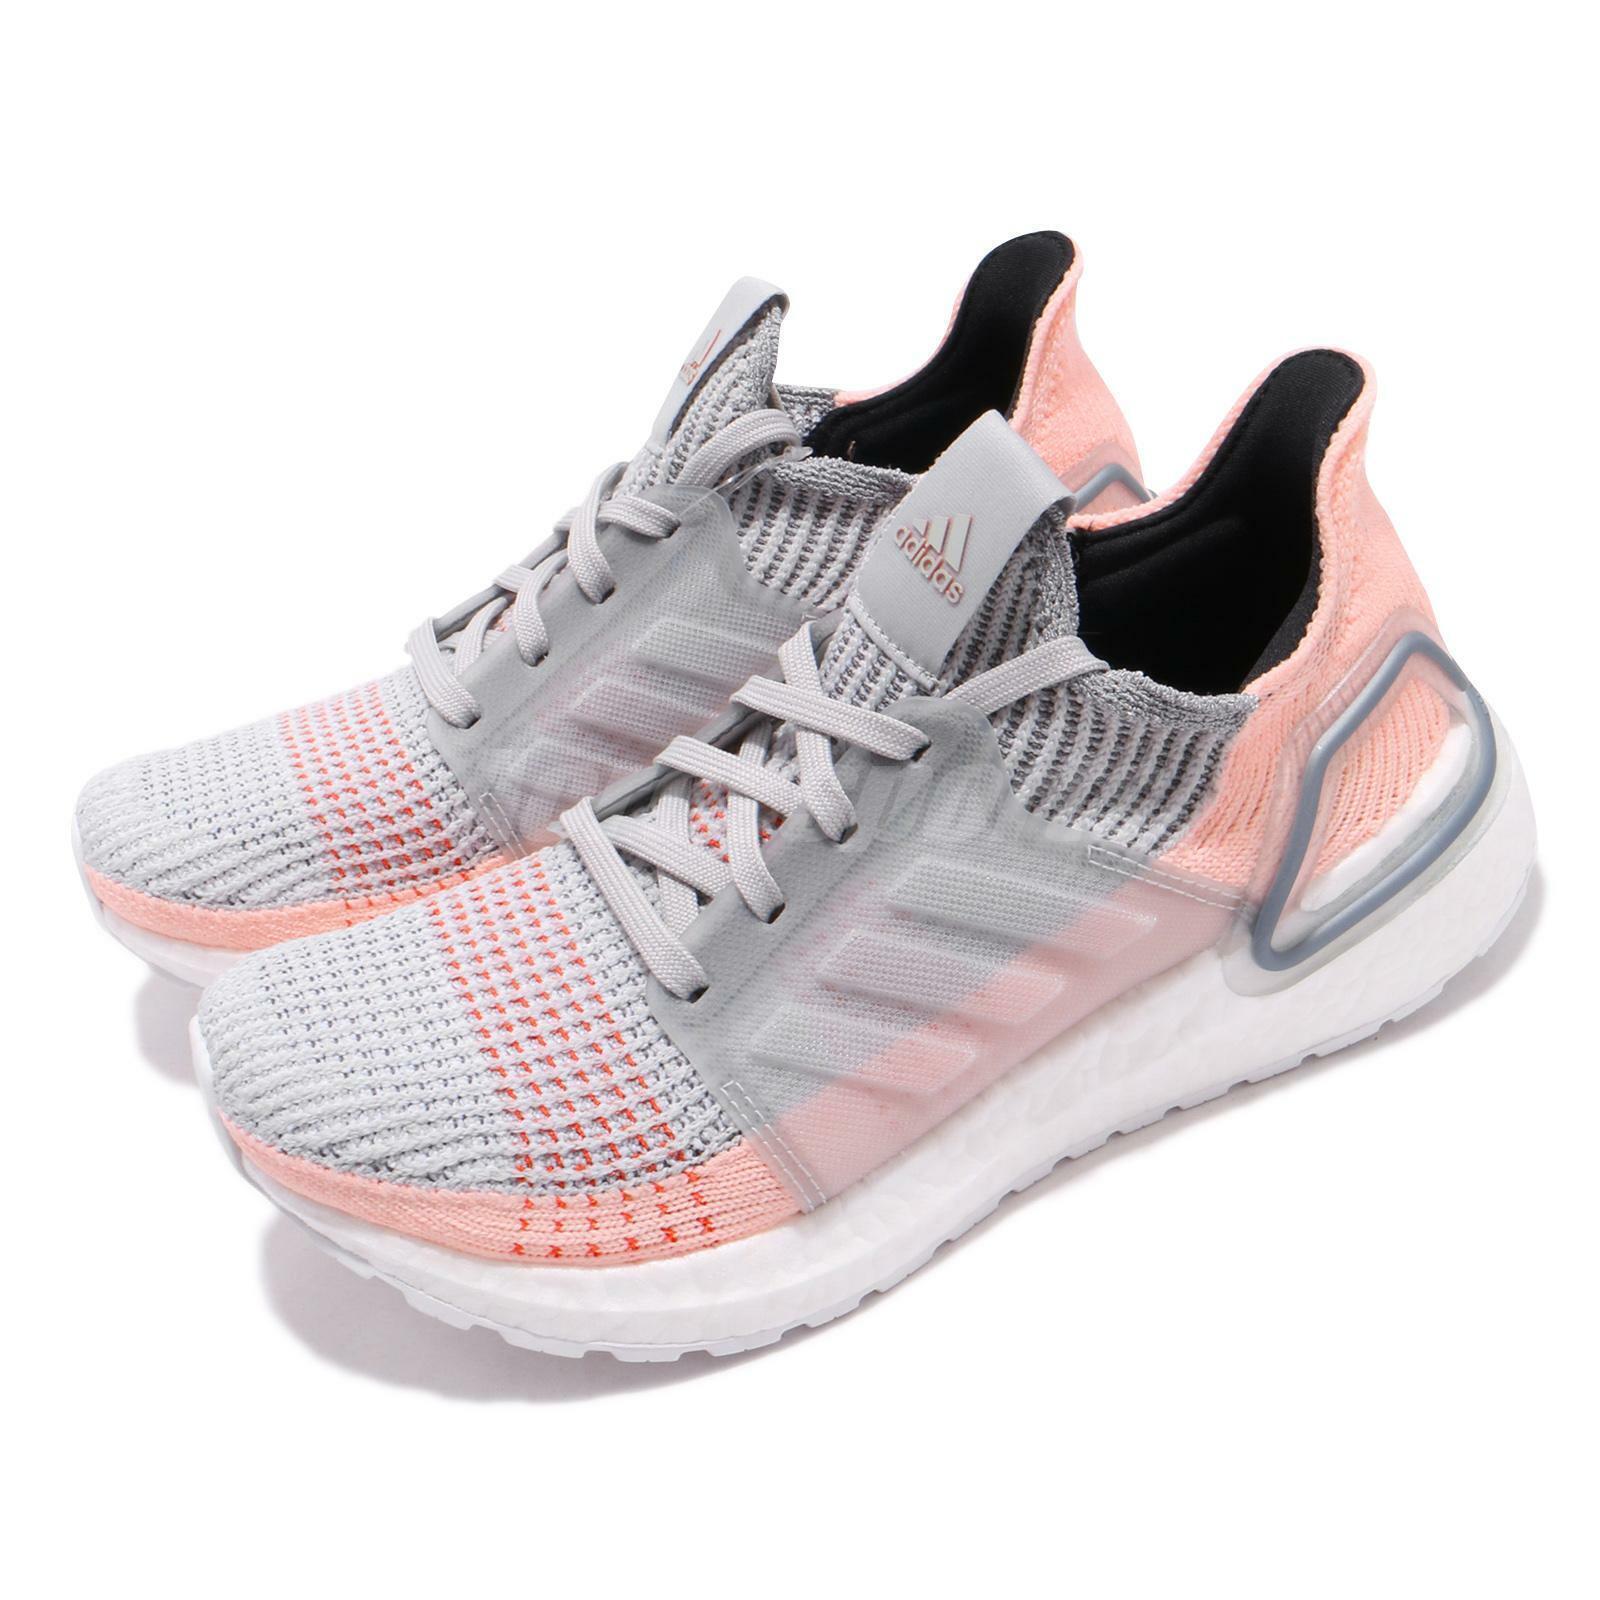 Adidas Ultraboost 19 gris Claro Naranja Mujer Running Zapatos TENIS B75881